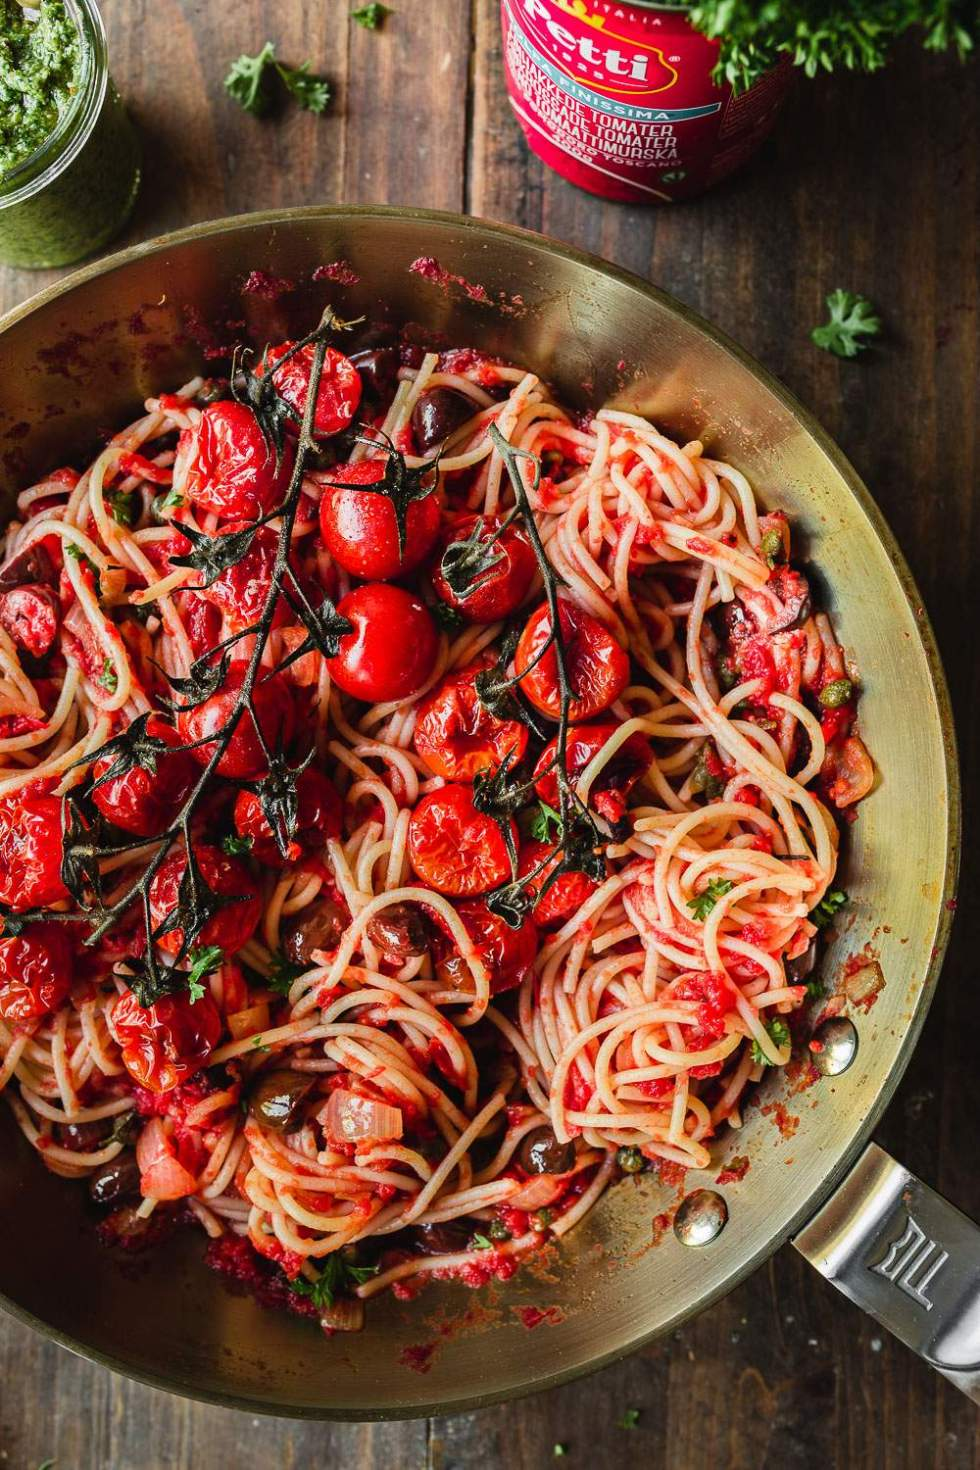 Vegan pasta puttanesca with parsley pesto